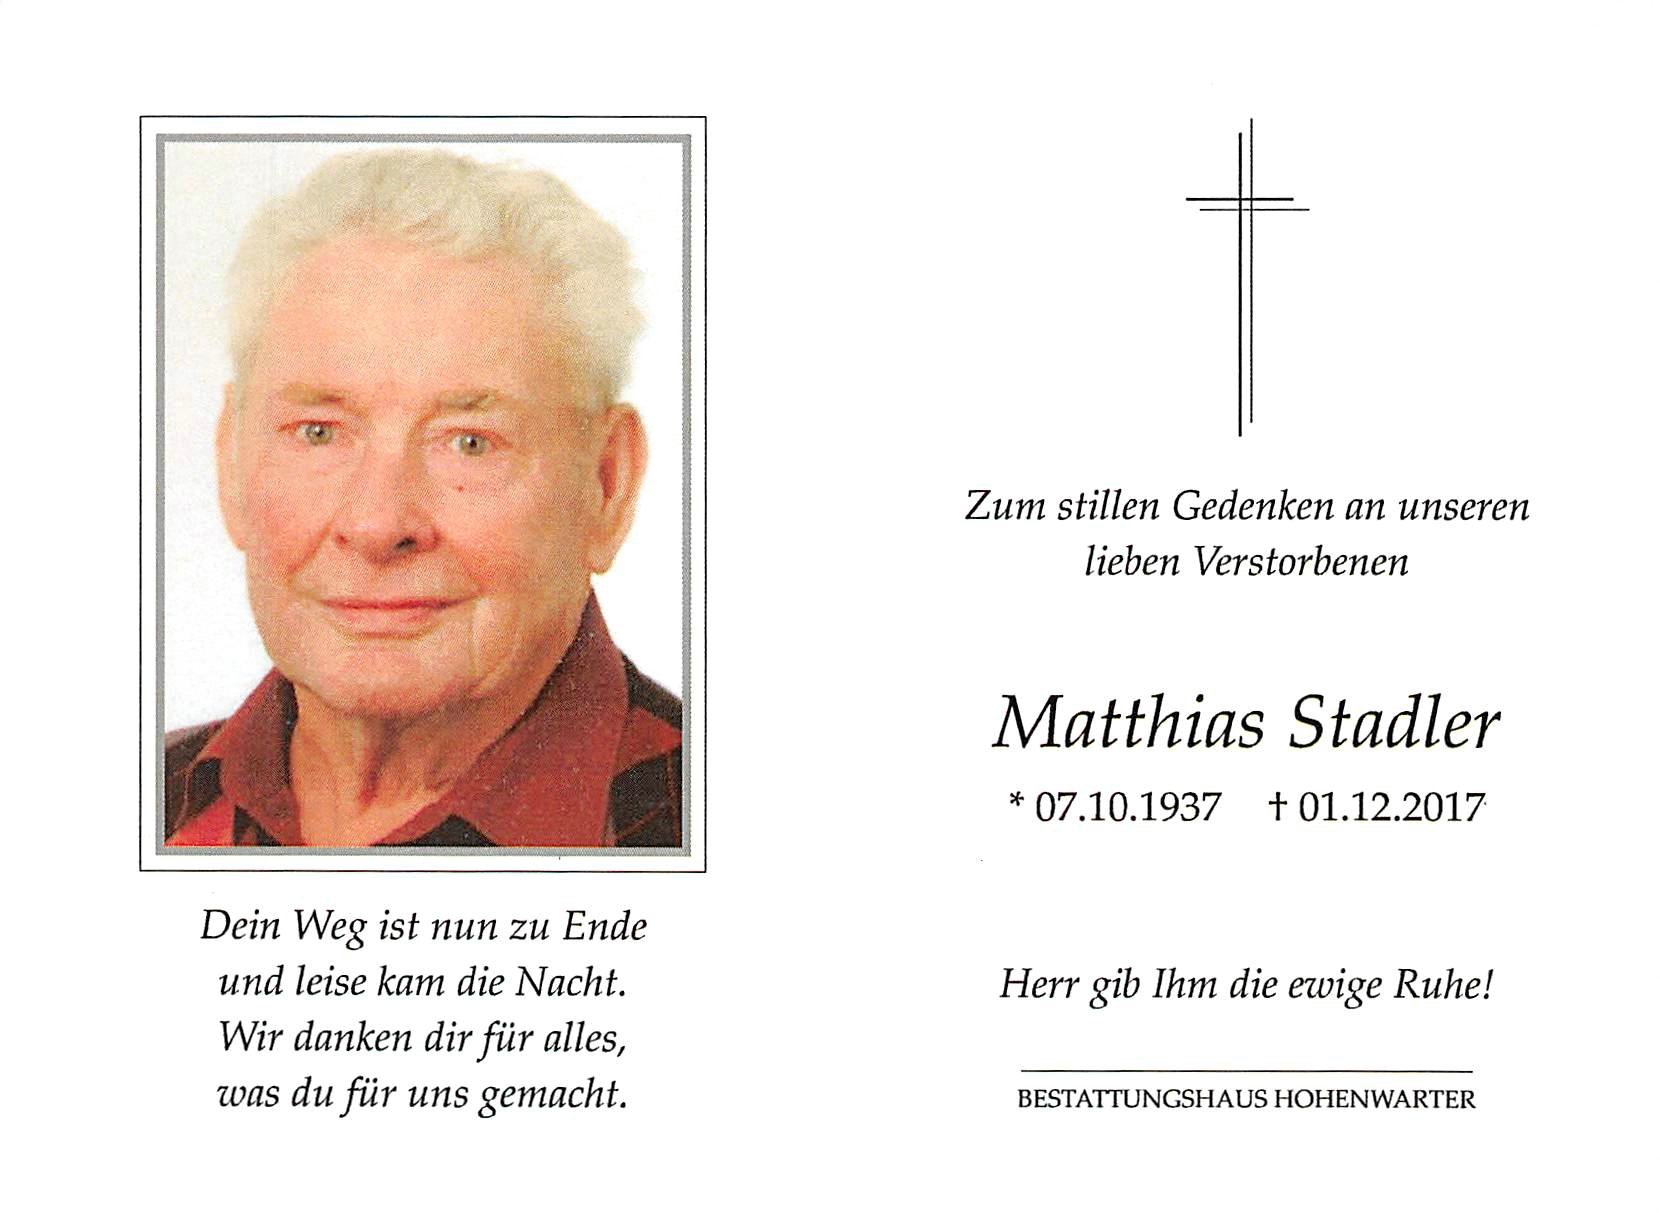 2017-12-01-Stadler-Matthias-Holzfreyung